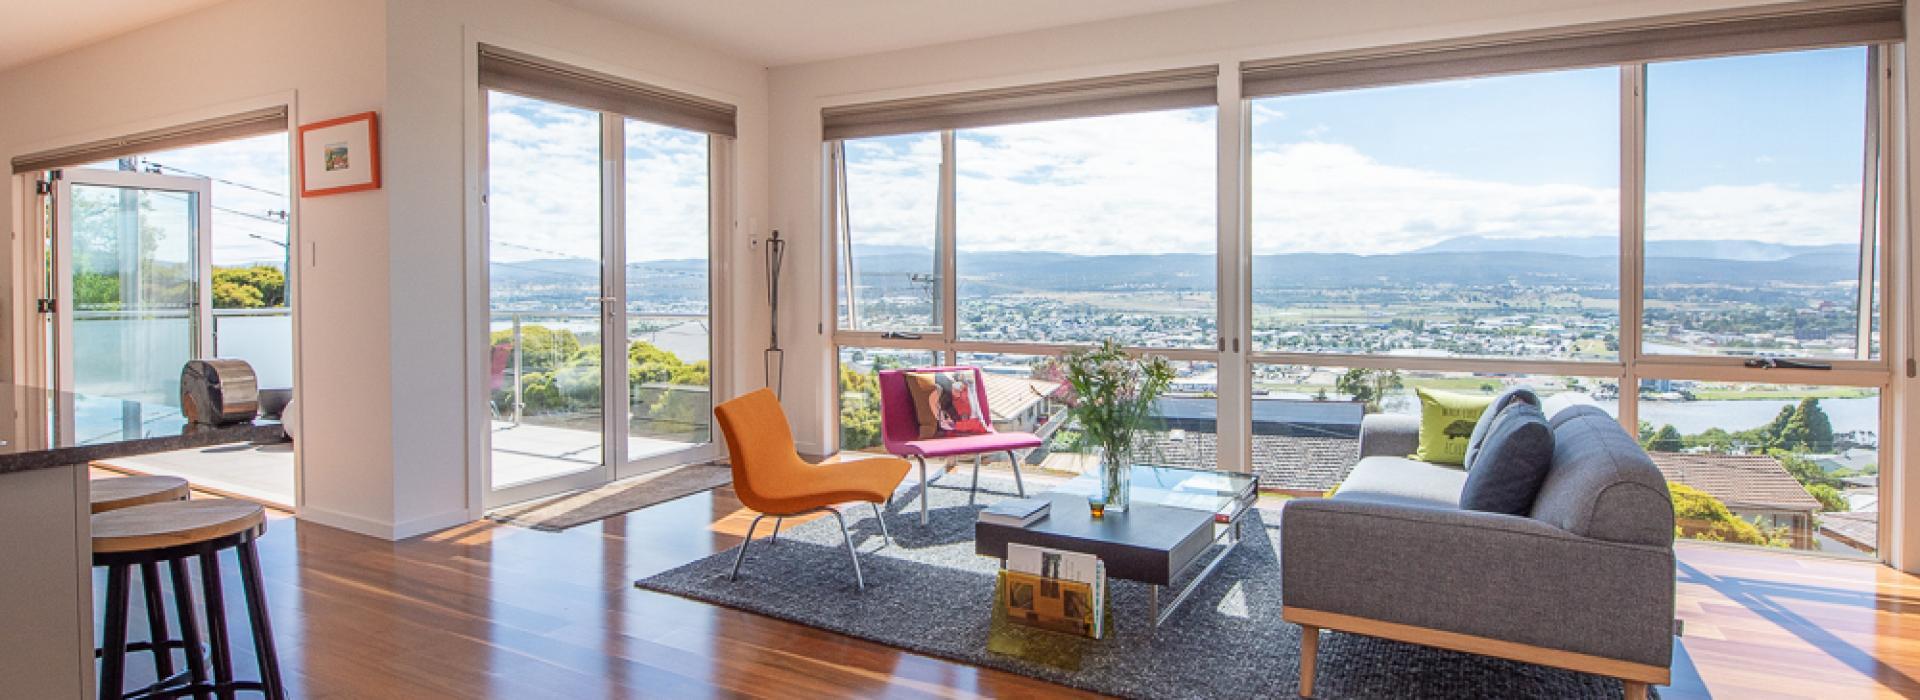 Flanagan Residential | Paul Flanagan | Property Sales | Trevallyn